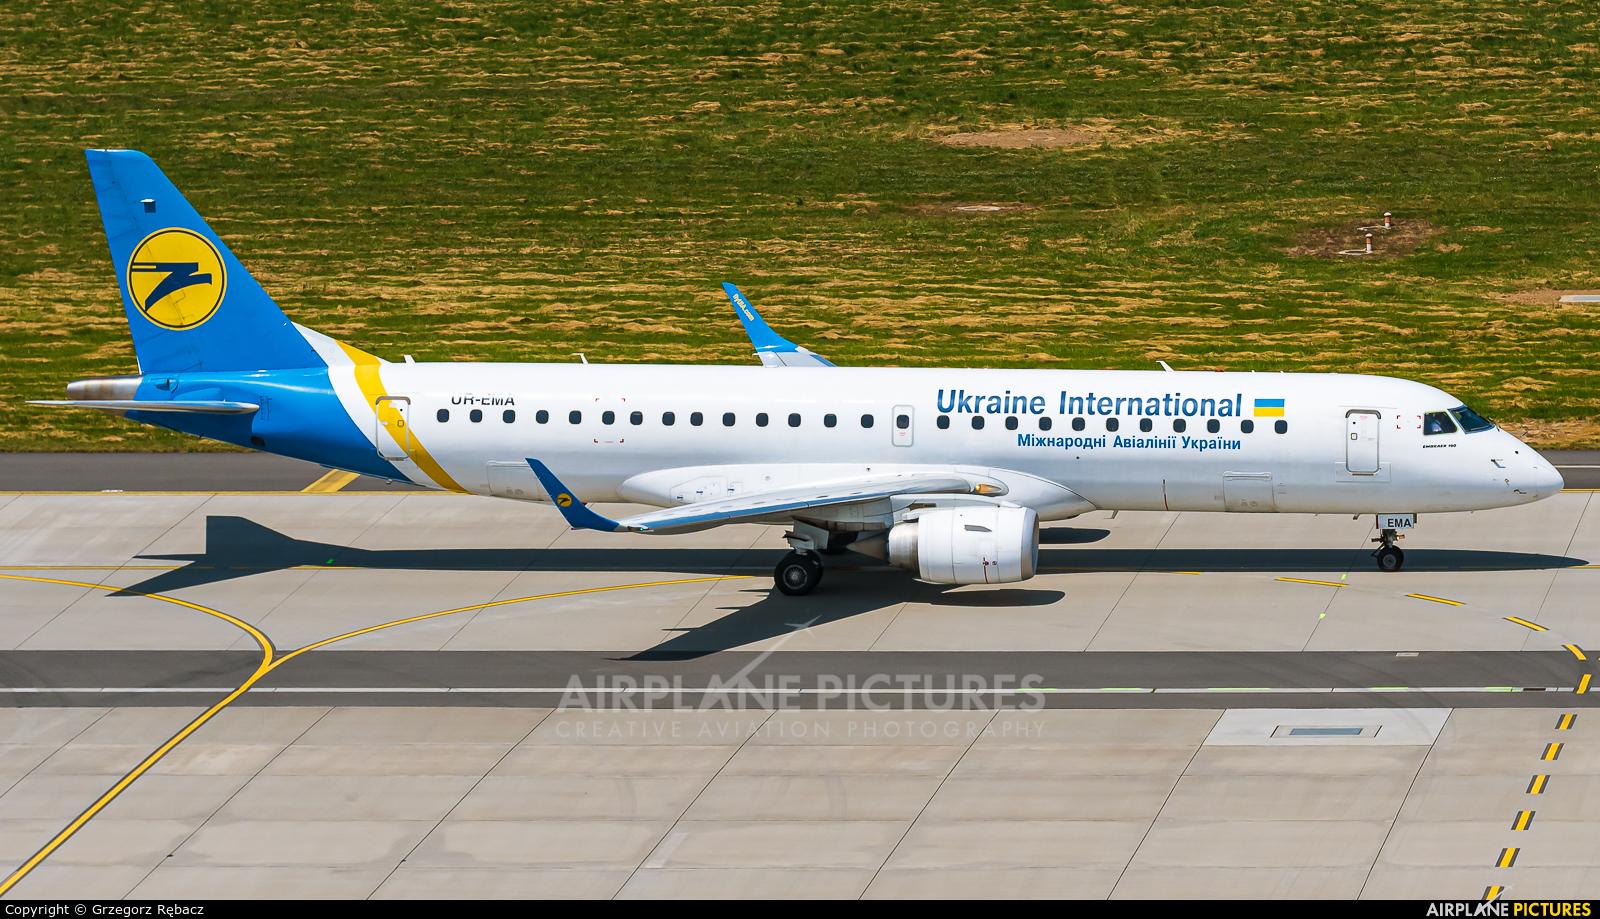 Ukraine International Airlines UR-EMA aircraft at Kraków - John Paul II Intl